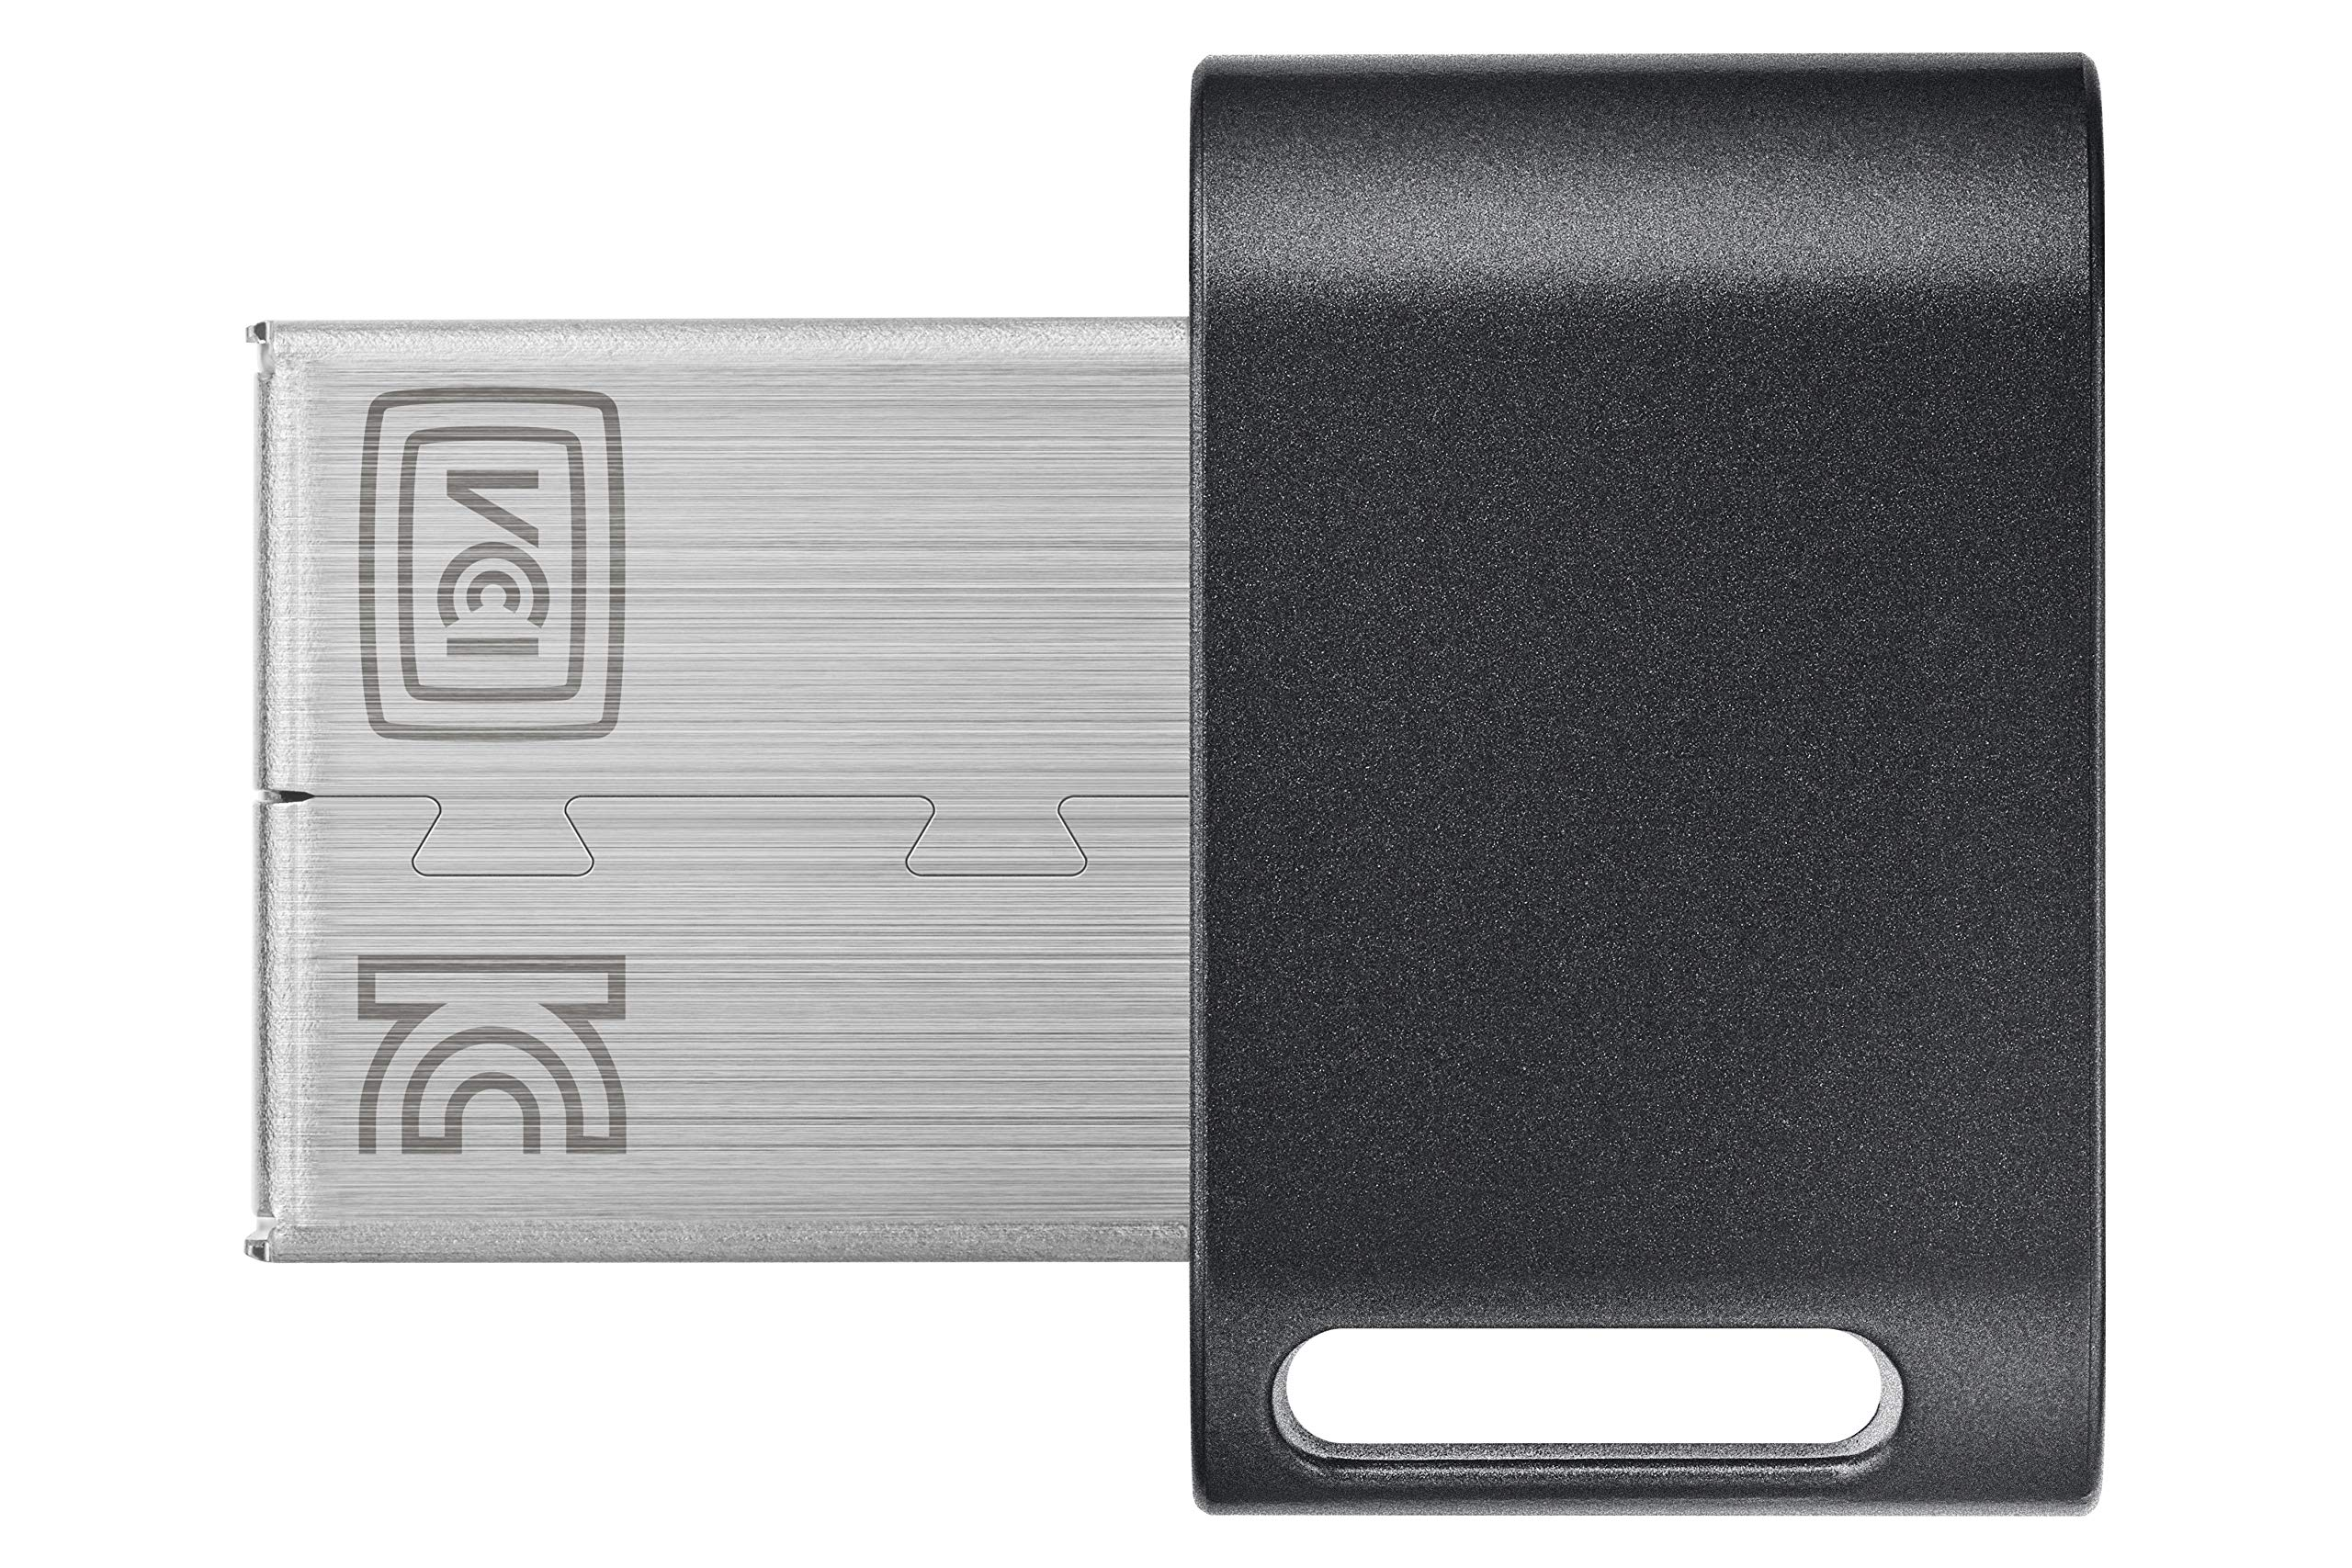 Samsung MUF-64AB/AM FIT Plus 64GB - 200MB/s USB 3.1 Flash Drive by Samsung (Image #4)